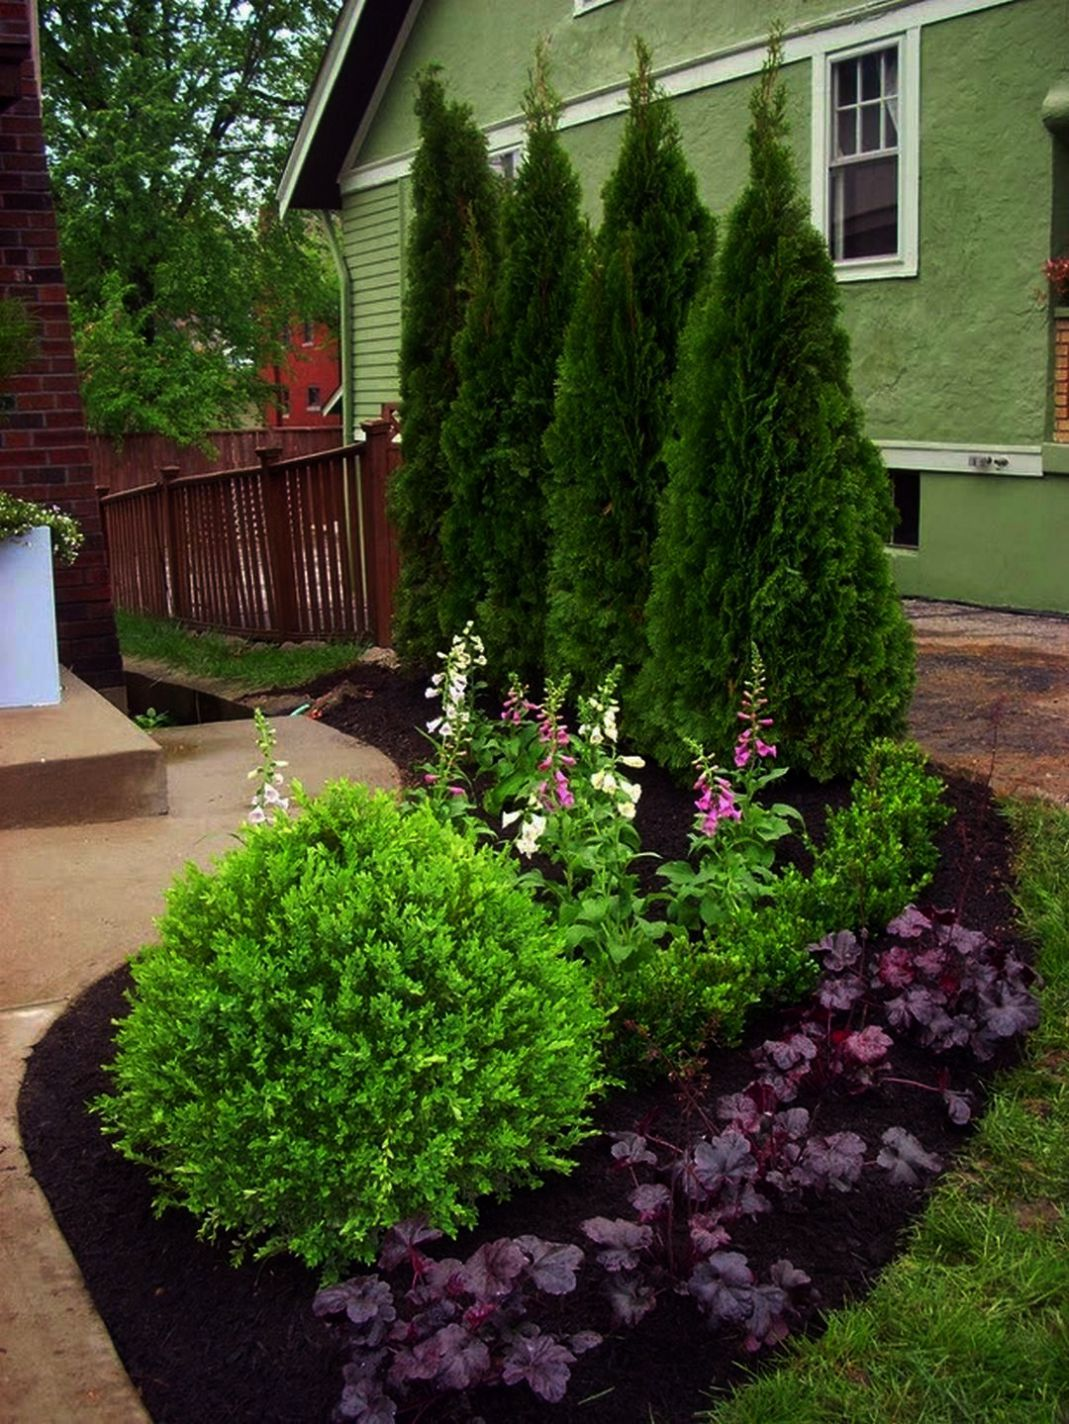 Landscaping Ideas For Backyard Creeks Order Backyard Landscape Design On A Bu Diy Backyard Landscaping Front Yard Landscaping Design Small Backyard Landscaping